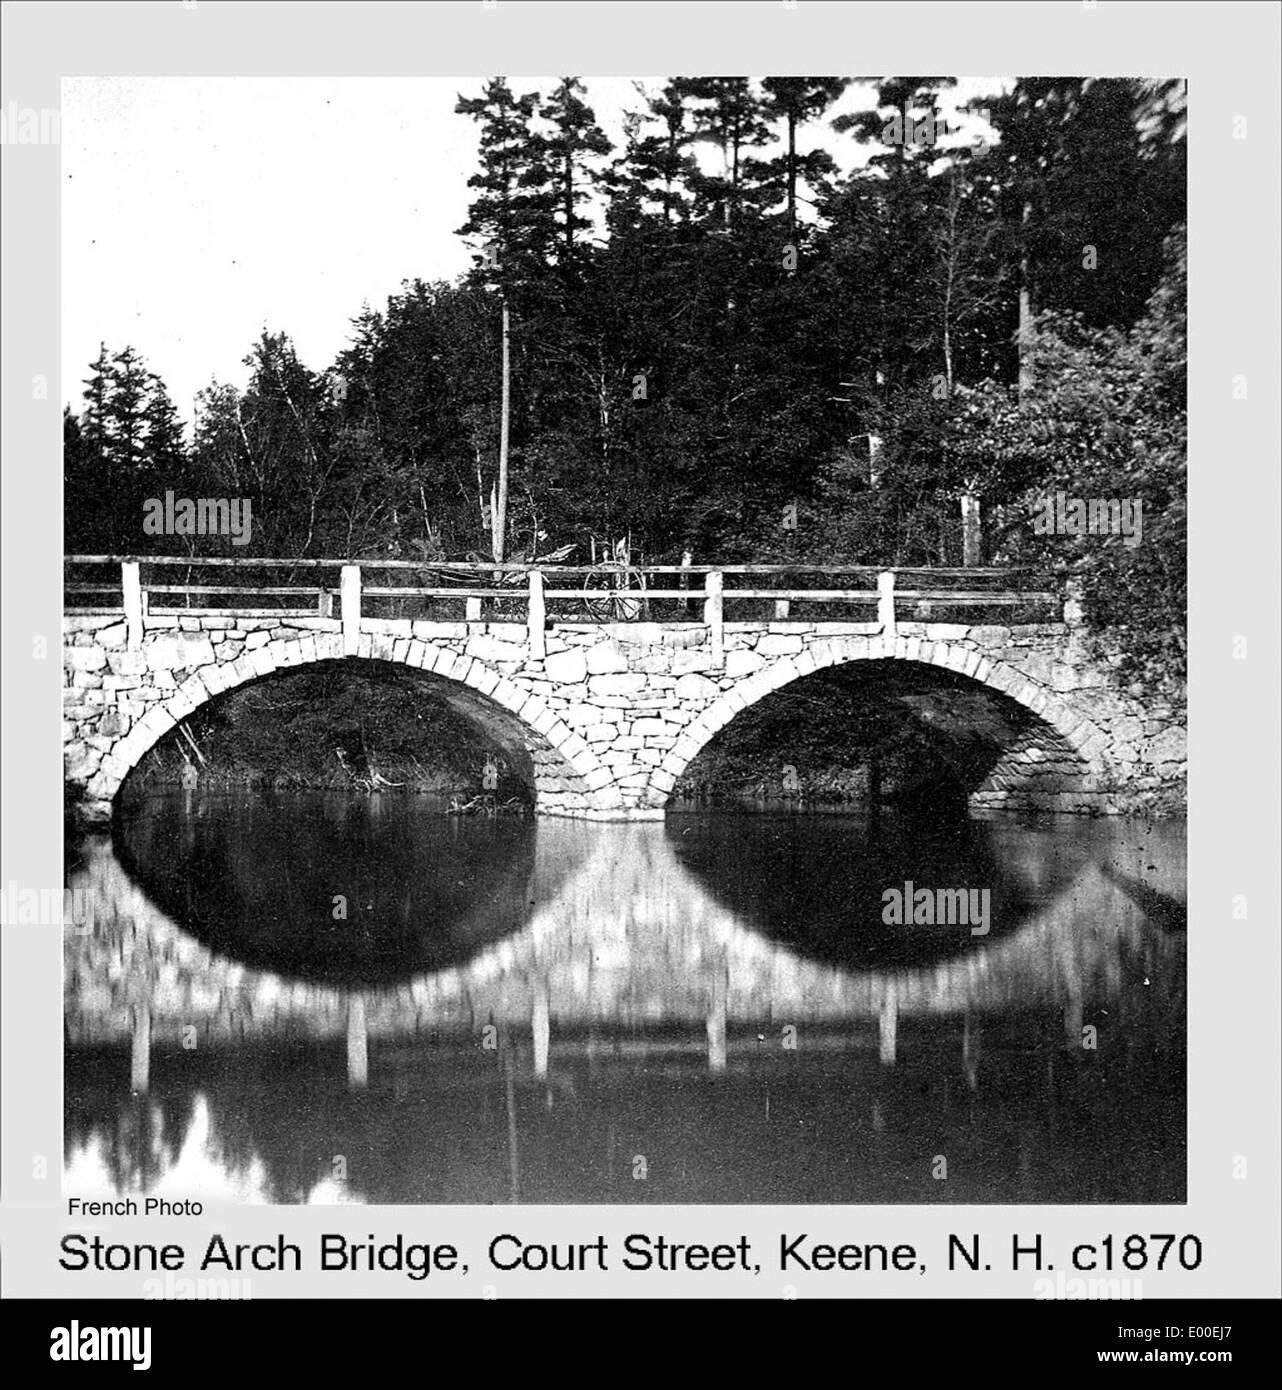 Arch Bridge, Keene New Hampshire - Stock Image